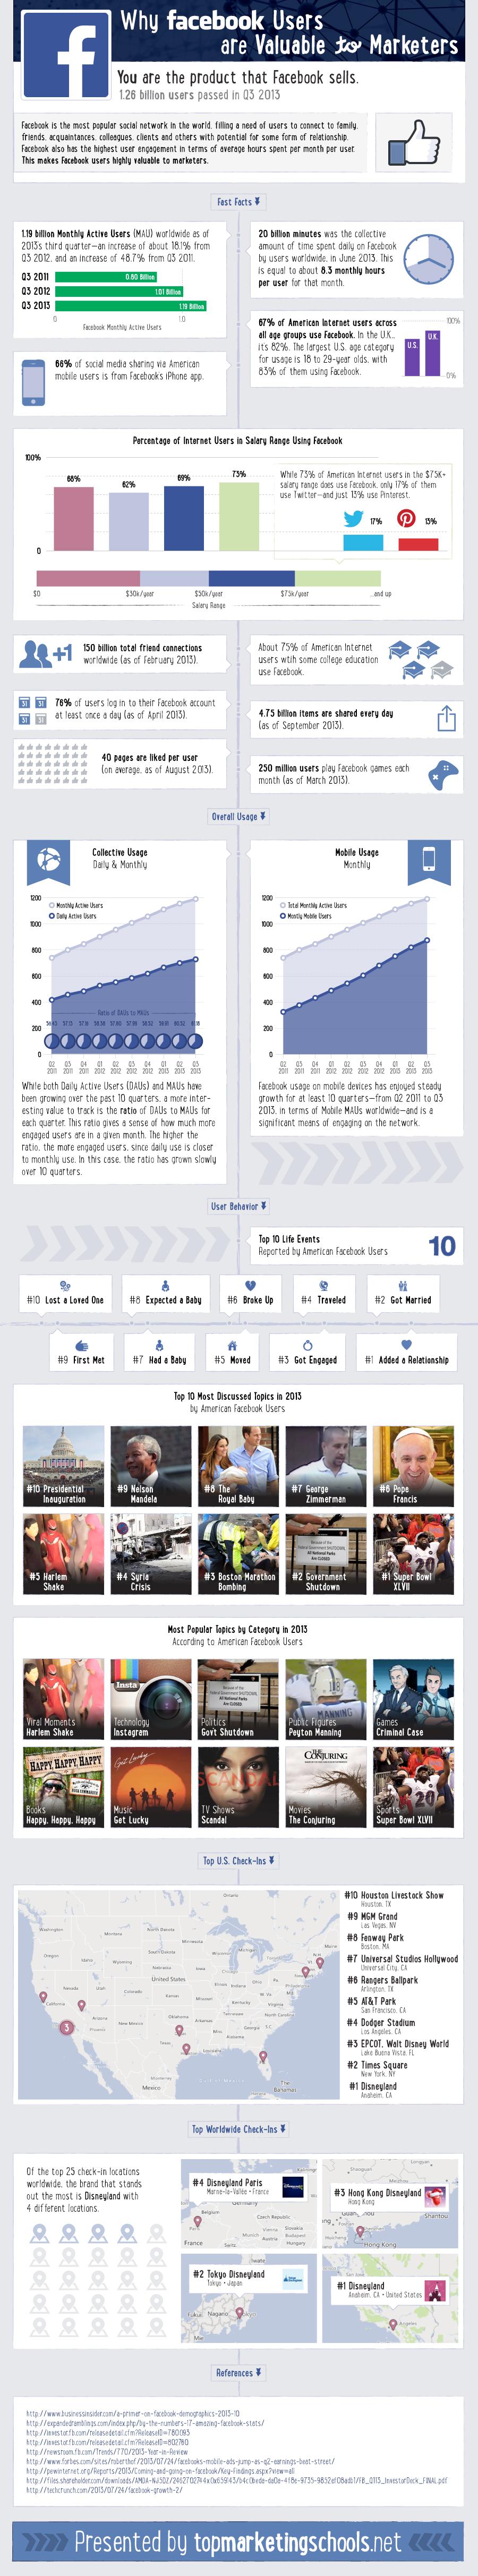 facebookmktg